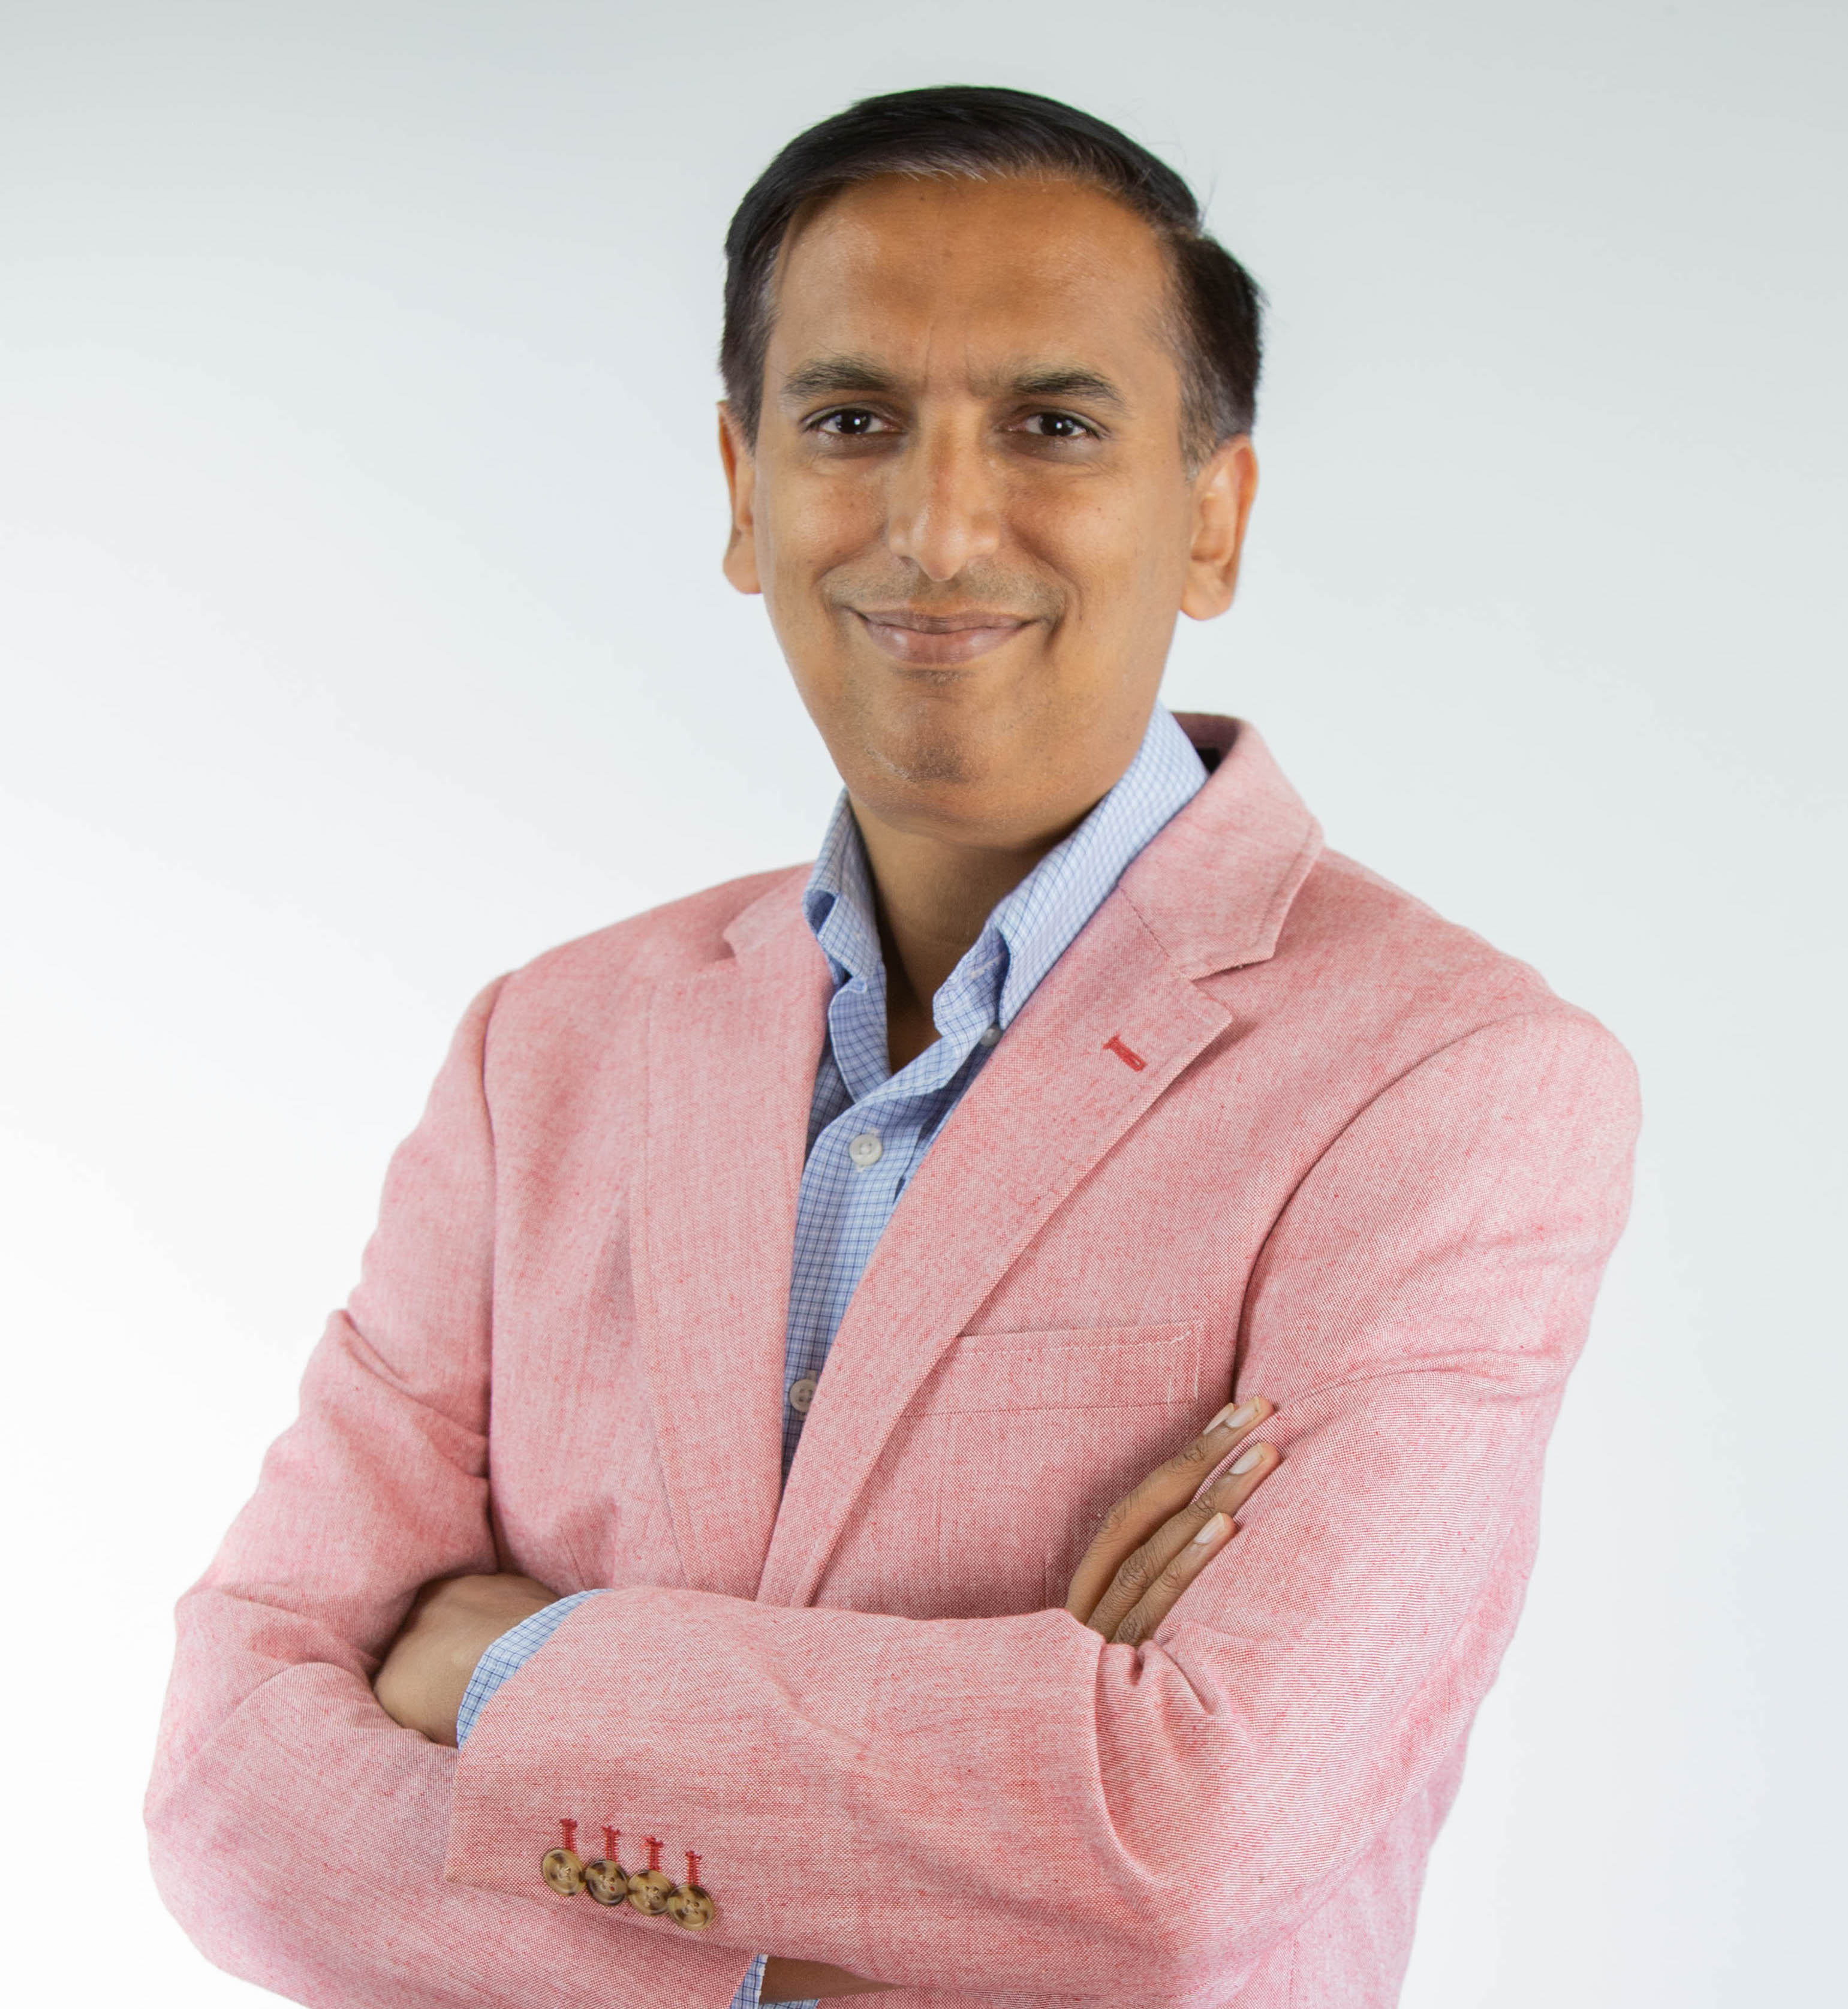 Ey Announces Naveen Gupta Of Birdeye As An Entrepreneur Of The Year 2021 Southwest Award Winner 1628606132940